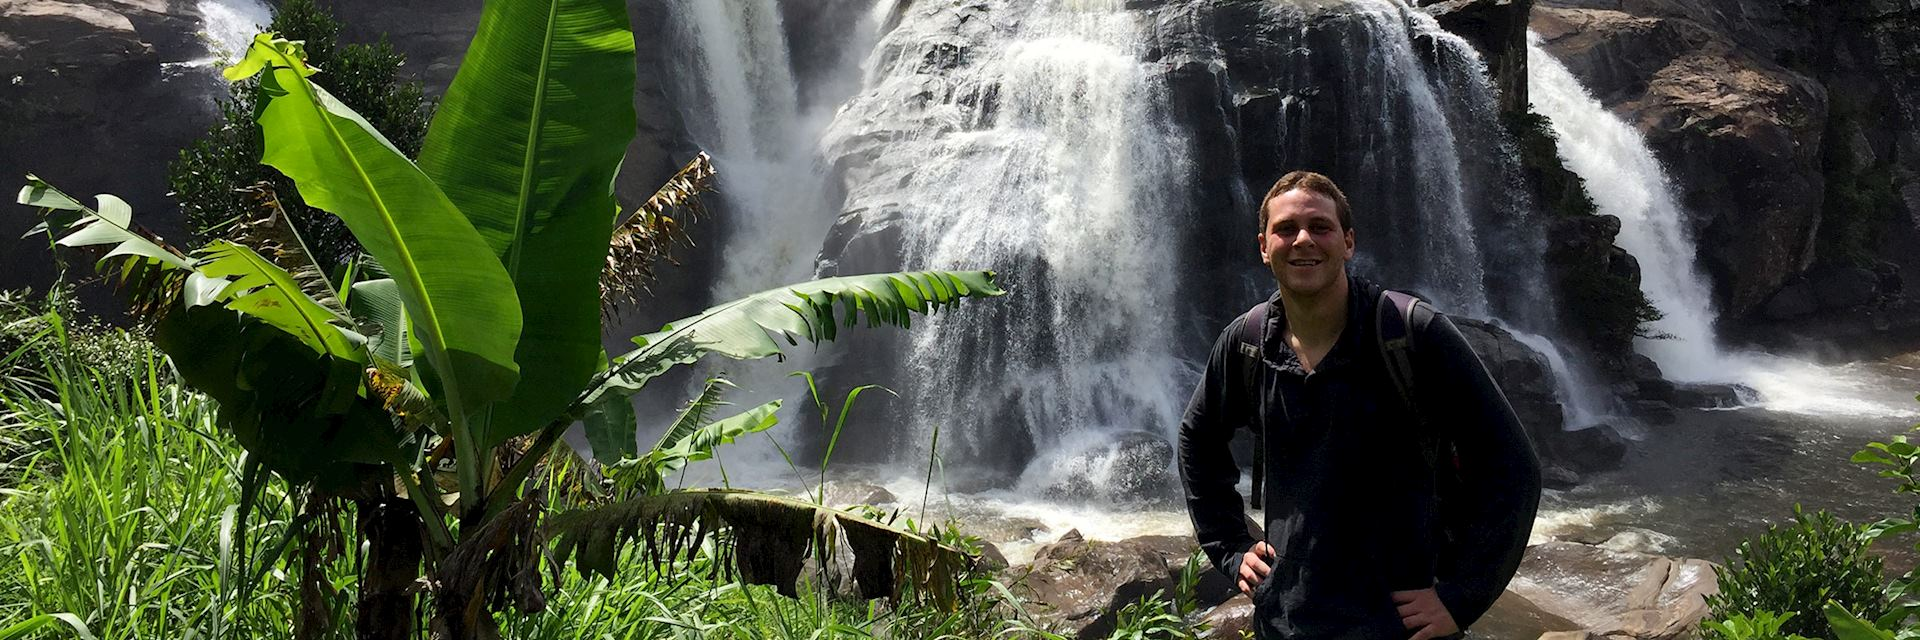 Mike in Ranomafana National Park, Madagascar